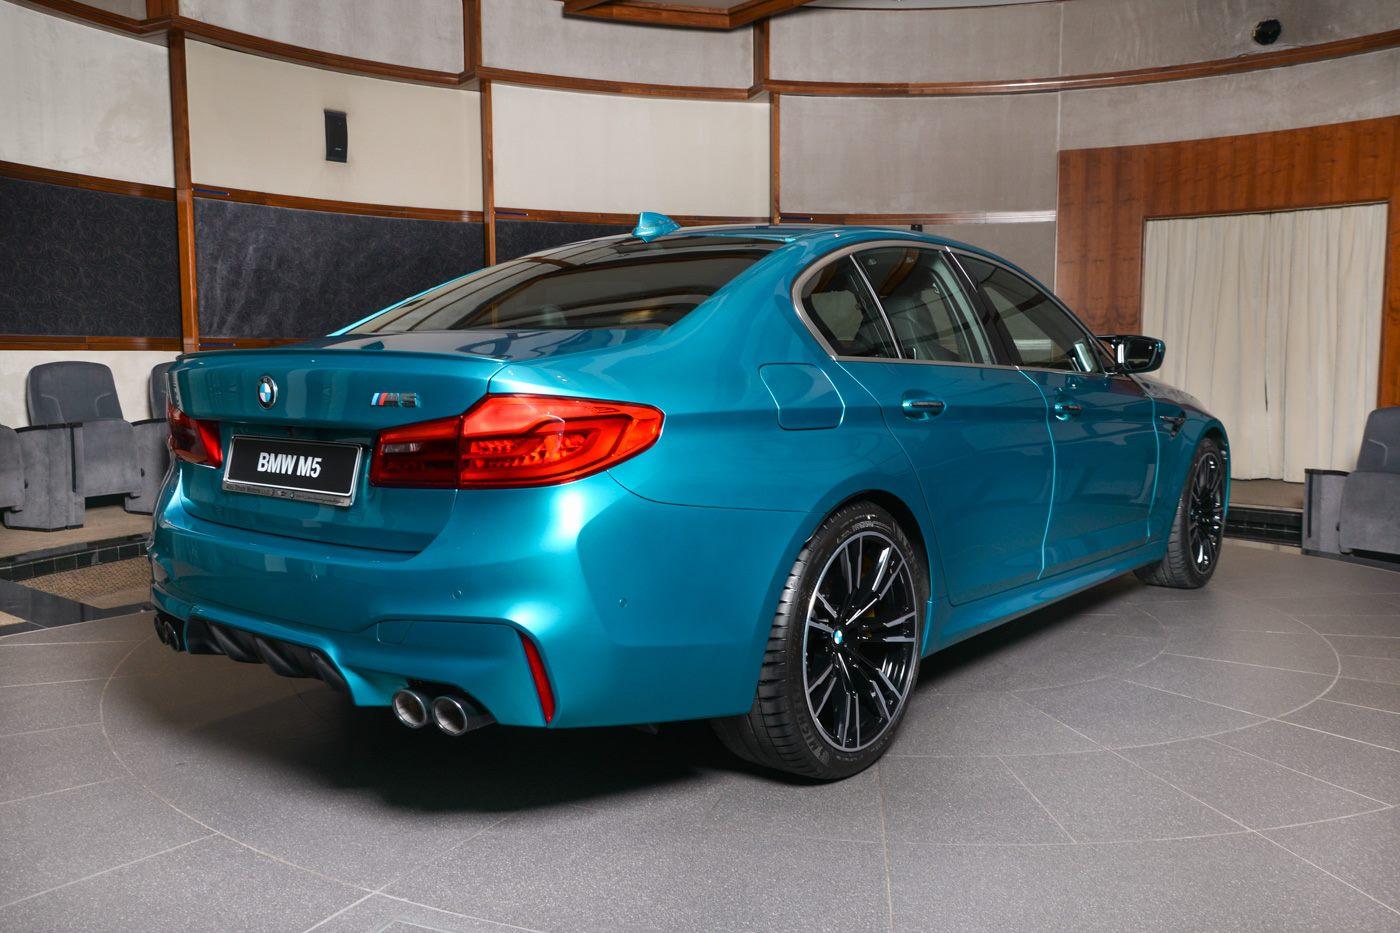 BMW_M5_Snapper_Rocks_Blue_0004